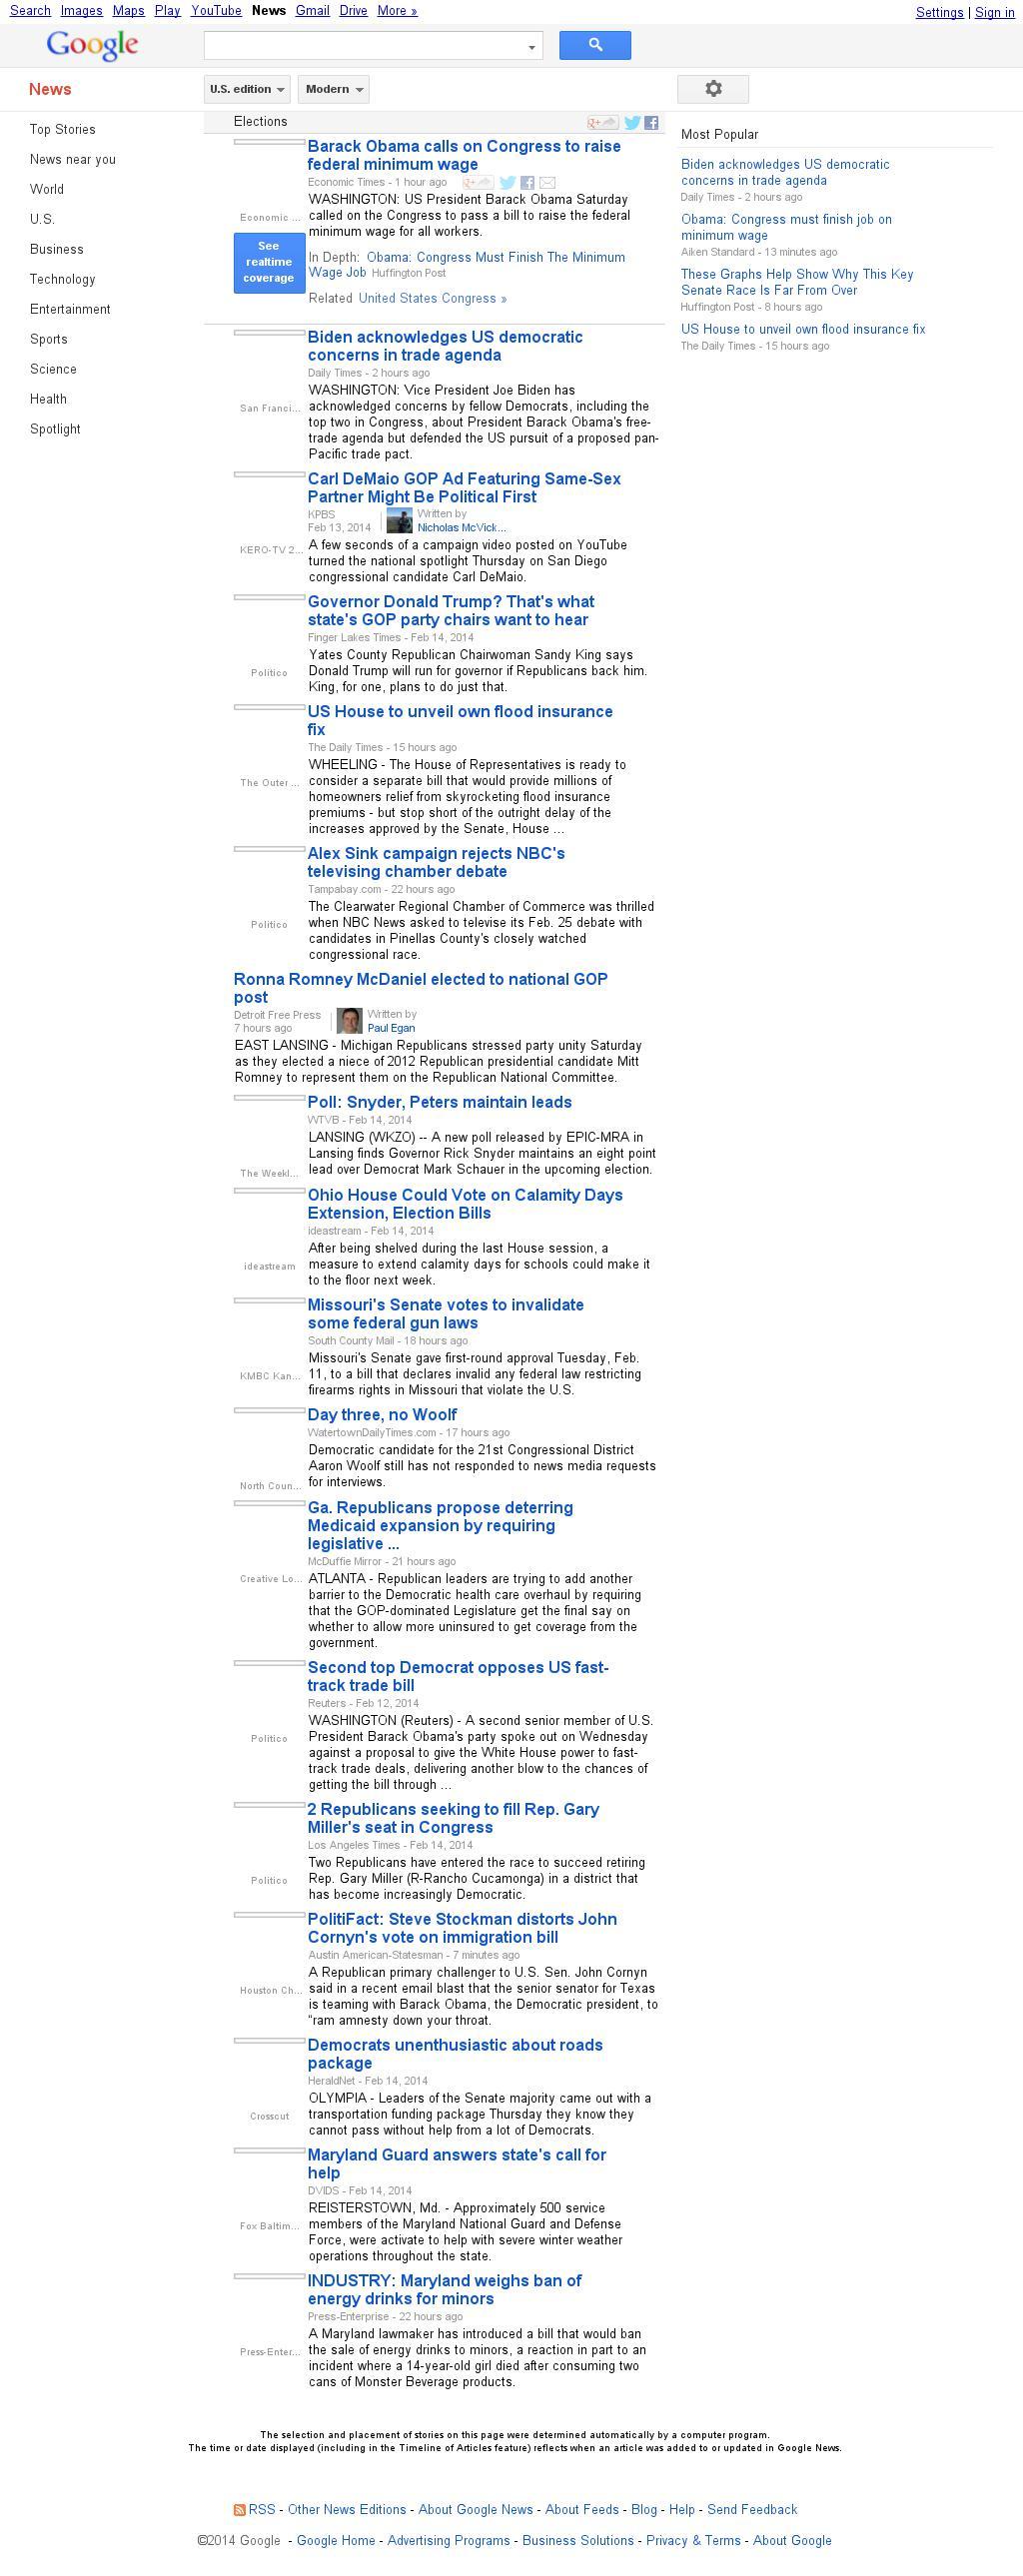 Google News: Elections at Saturday Feb. 15, 2014, 11:06 p.m. UTC